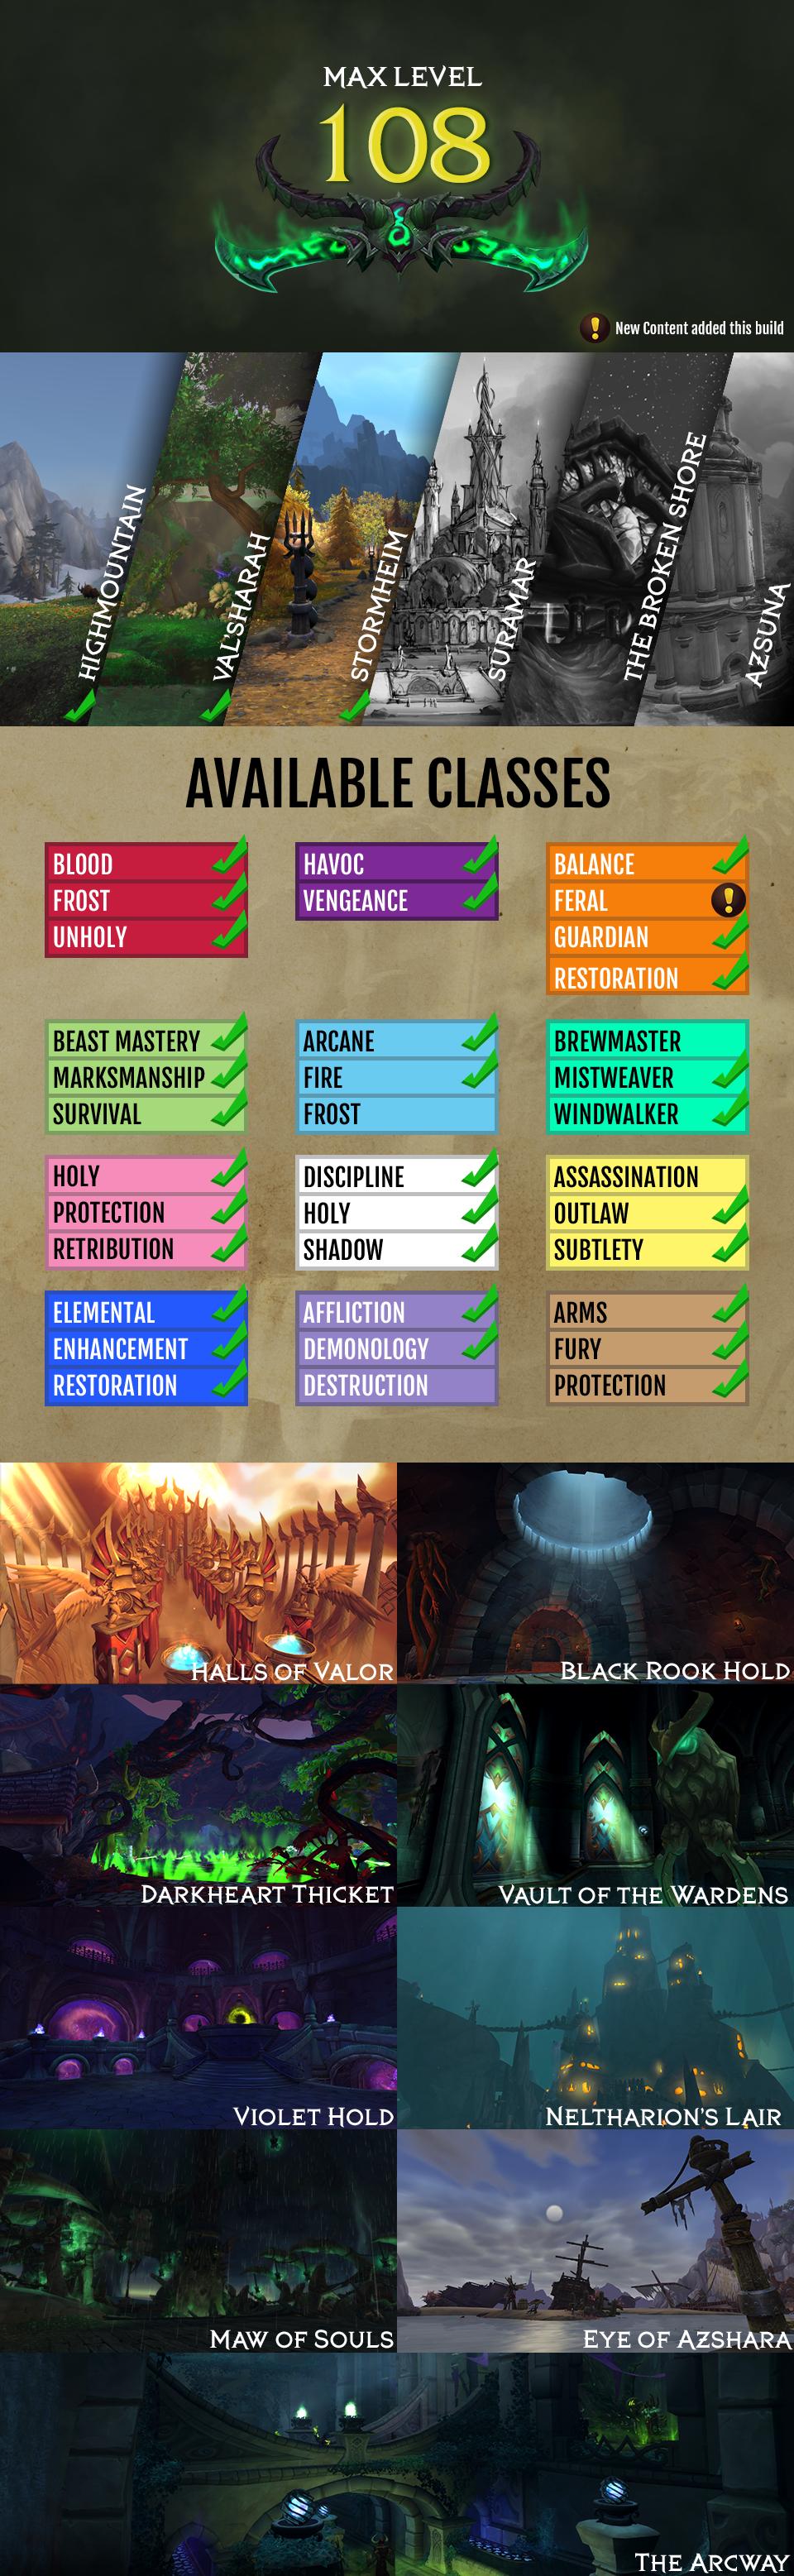 LegionAlphaAnnouncement_WoW_Infographic-blog_JM.png